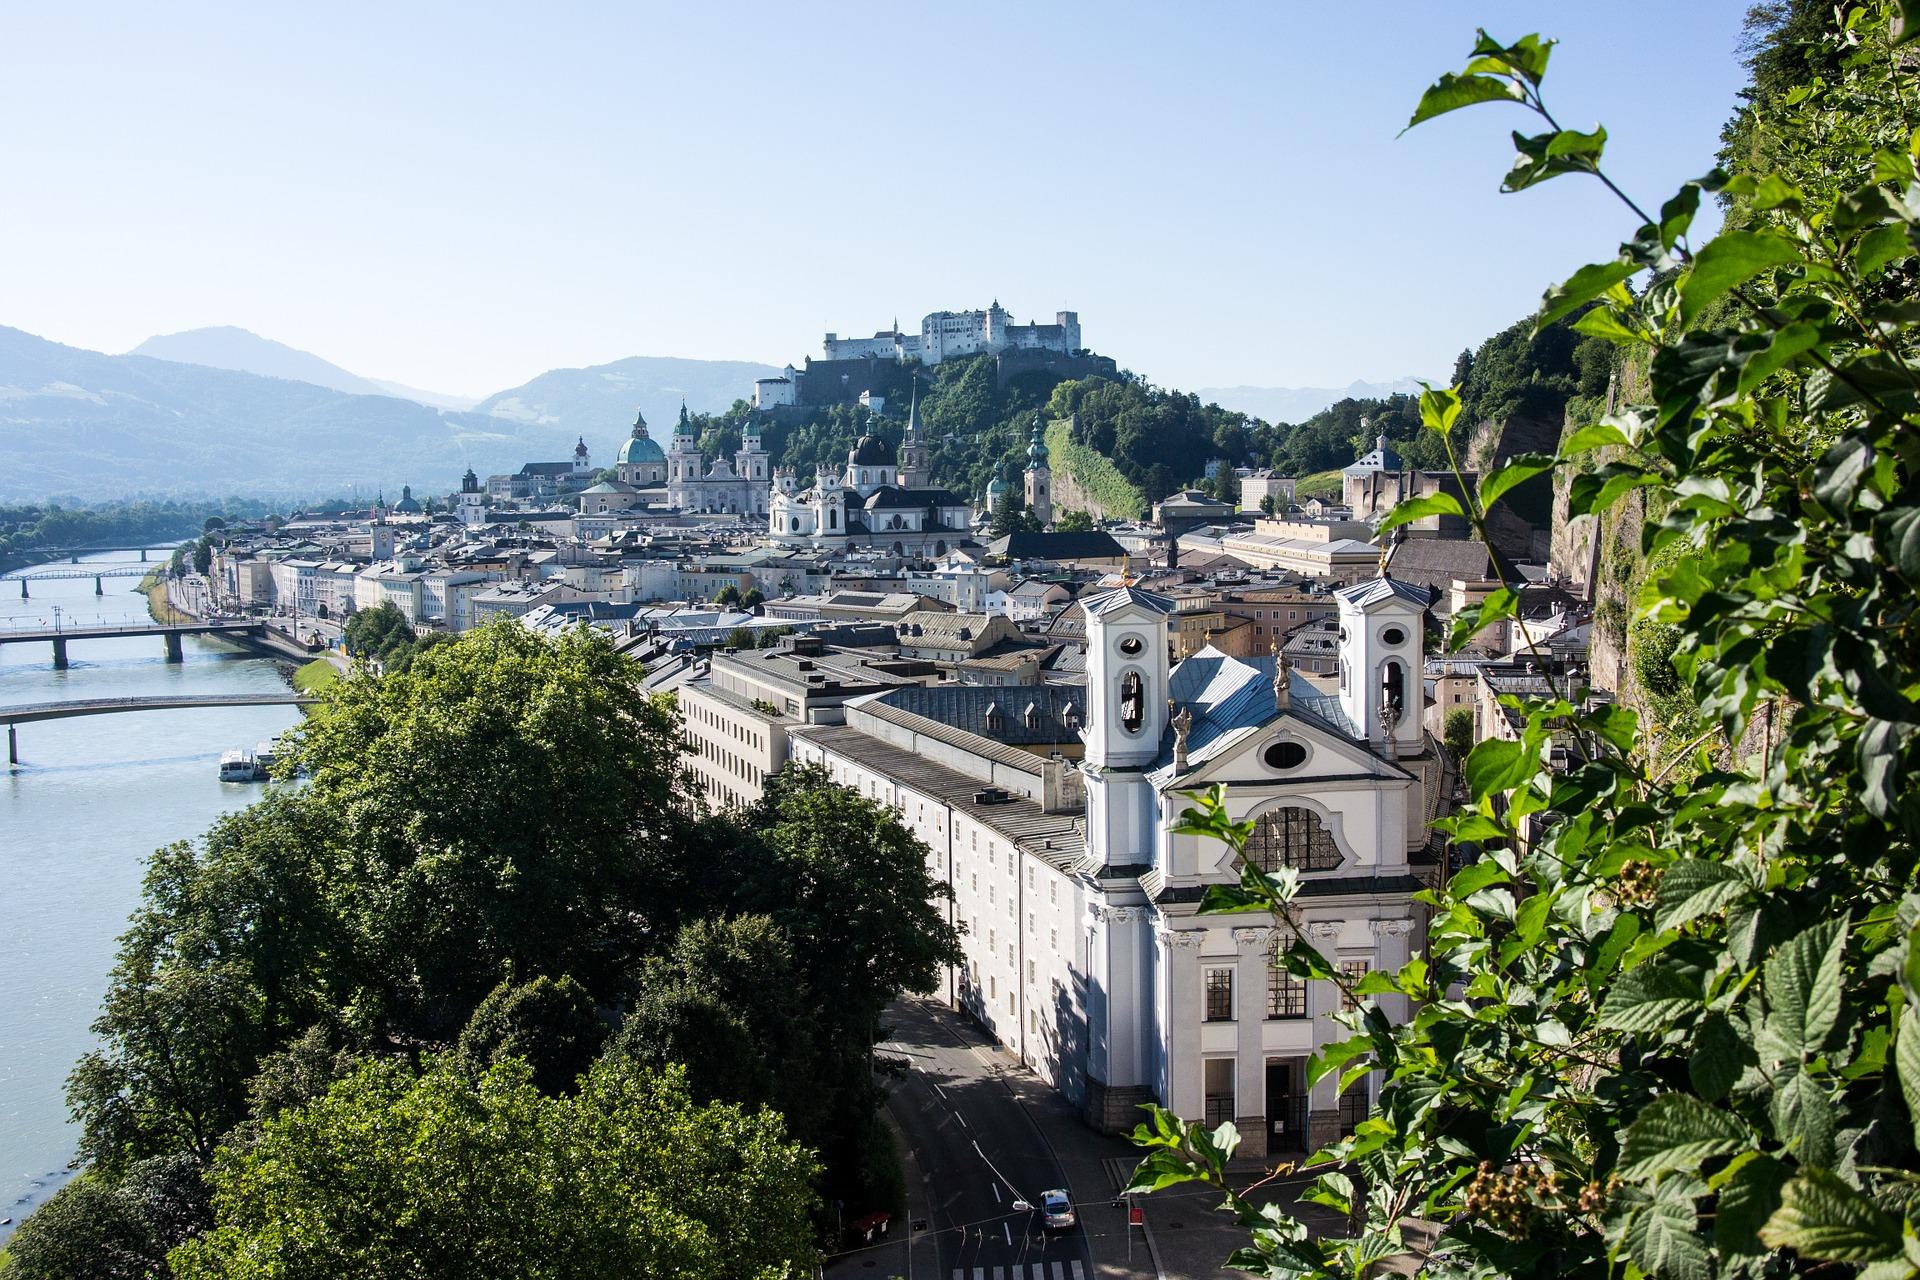 Avusturya, Salzburg